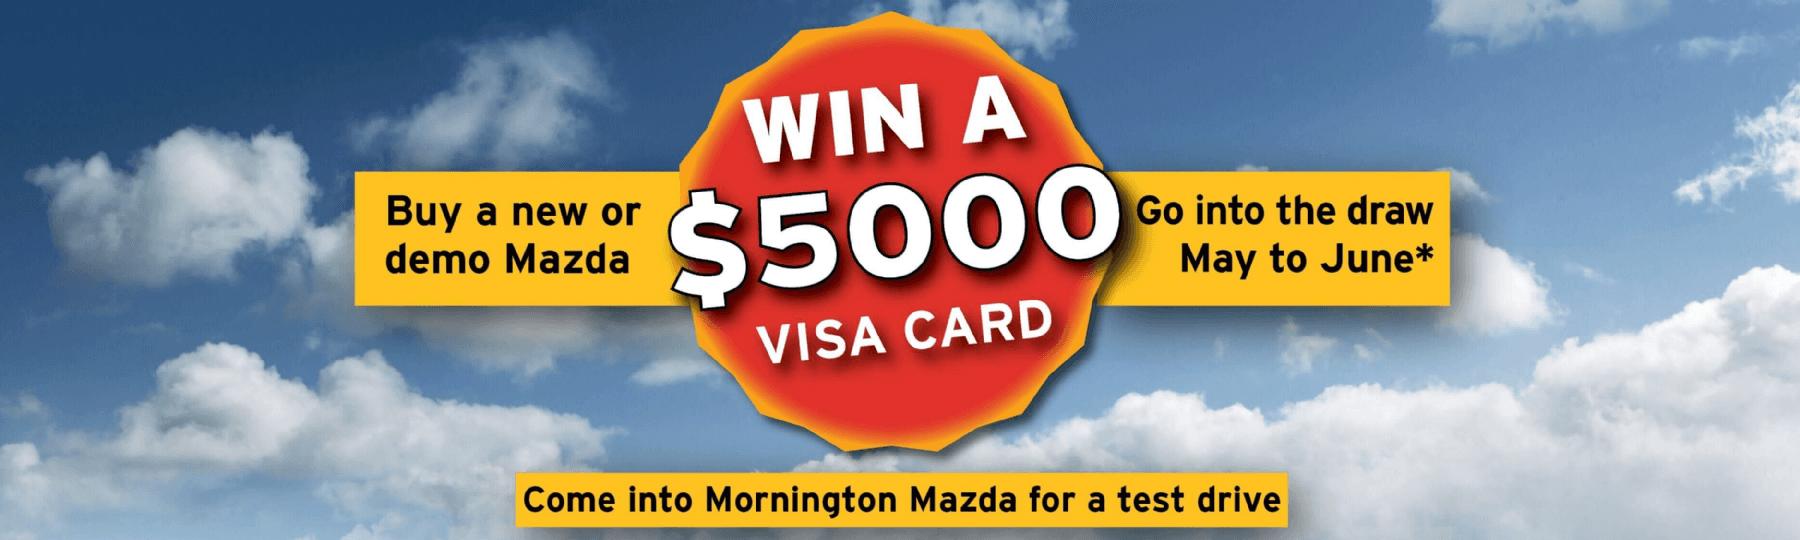 Win a $5000 Visa Card